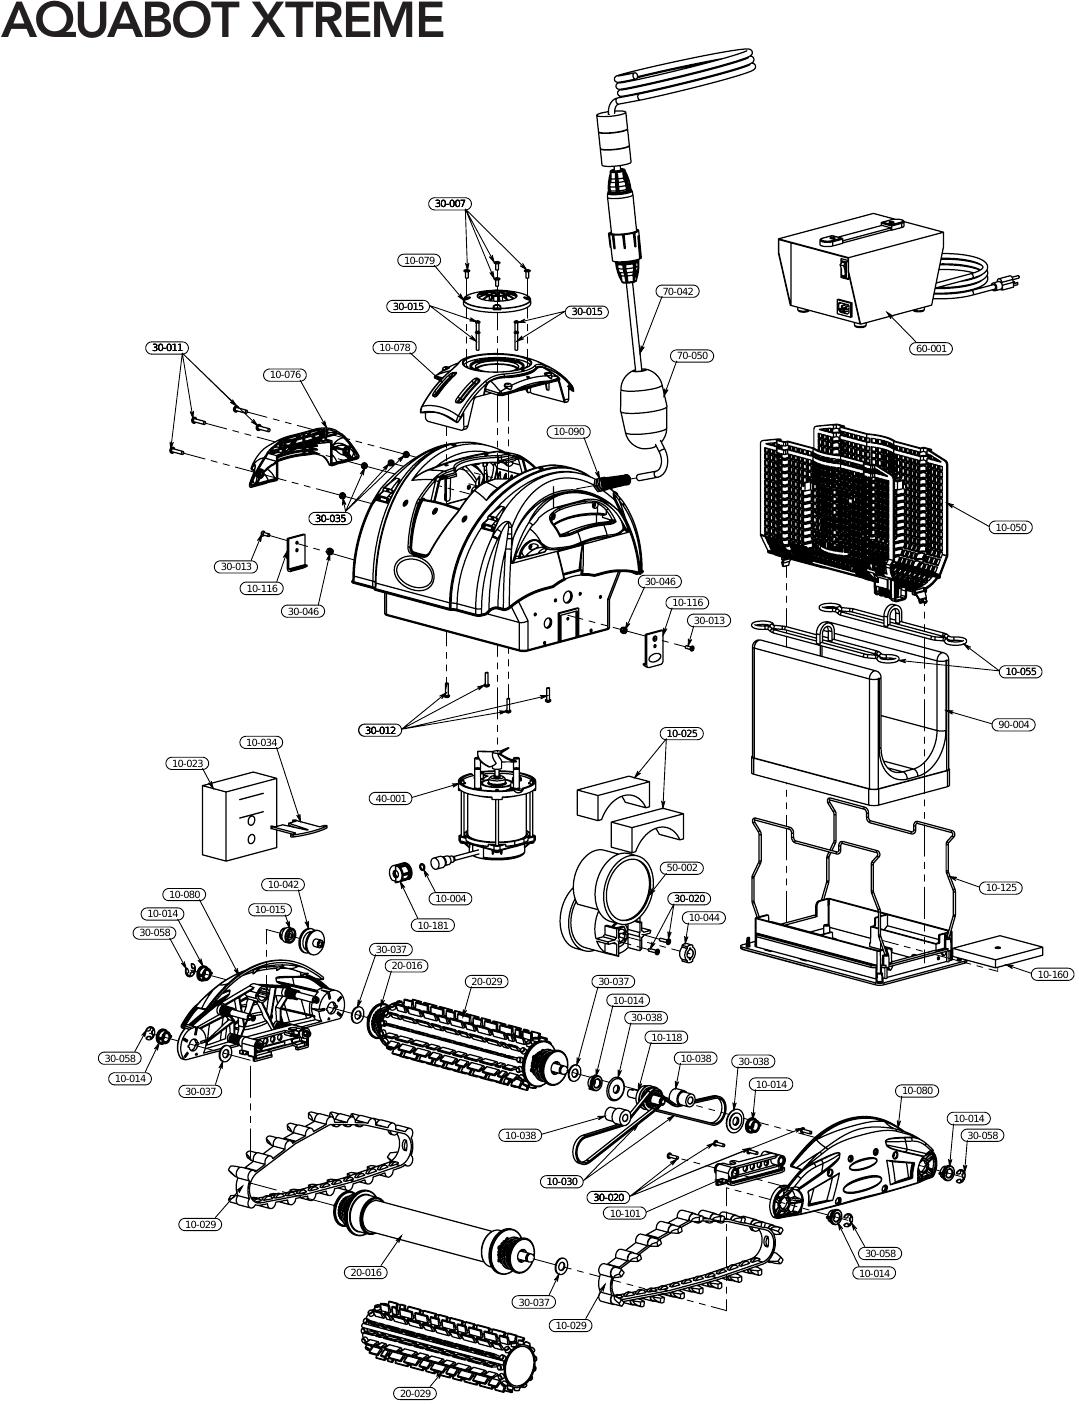 Parts Serial Diagram Aquabot 100ibftt77515 Manual Guide Wiring Eagle And Electrical Schematic U2022 Rh Whenintransit Com